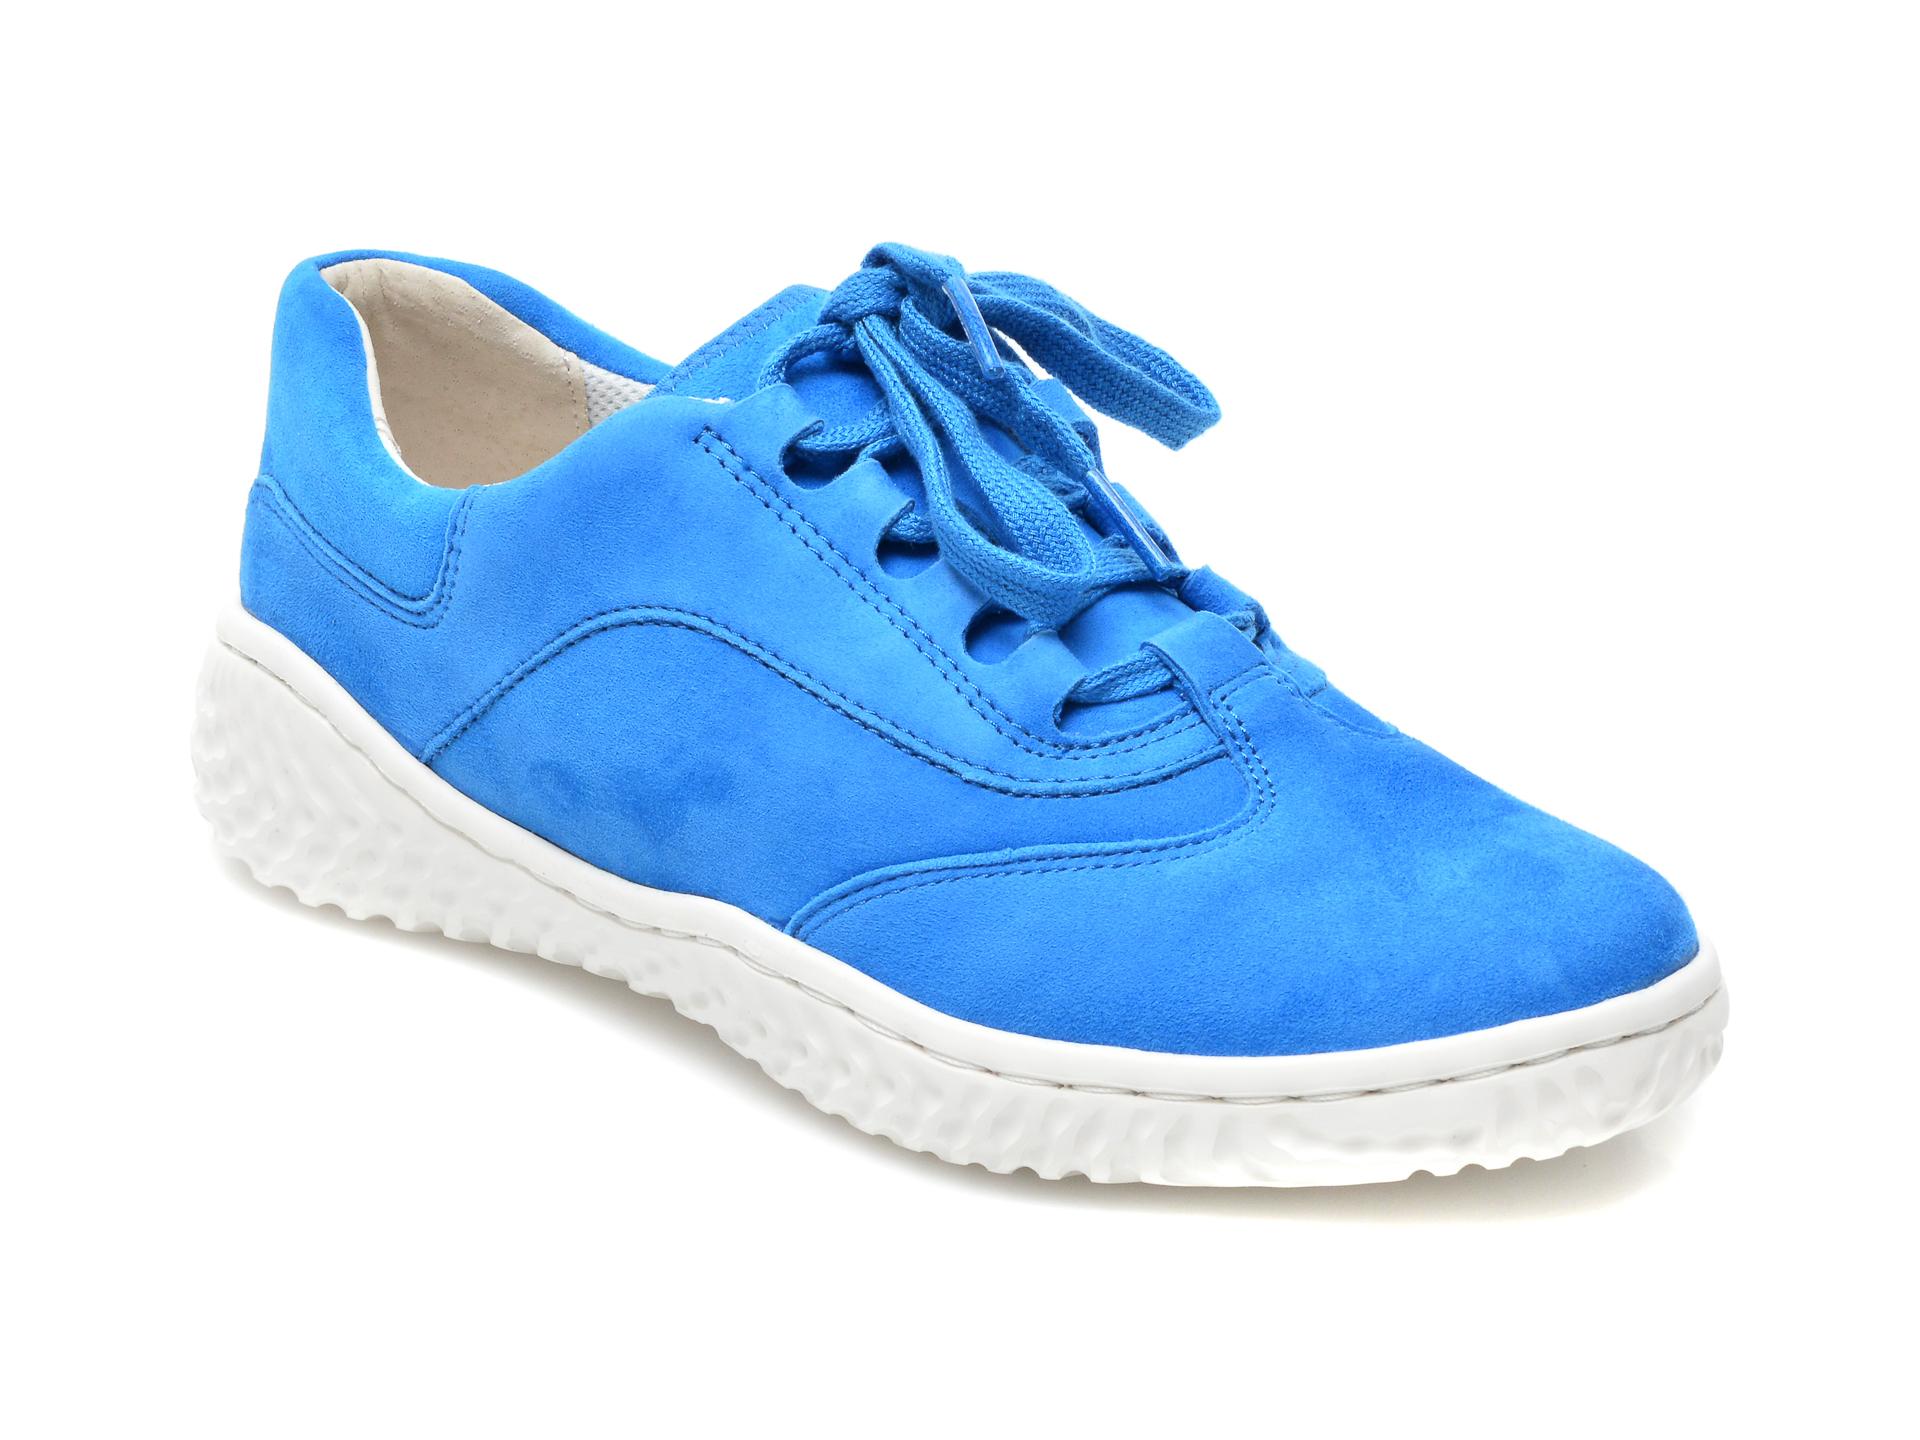 Pantofi Gabor Albastri, 43380, Din Piele Intoarsa